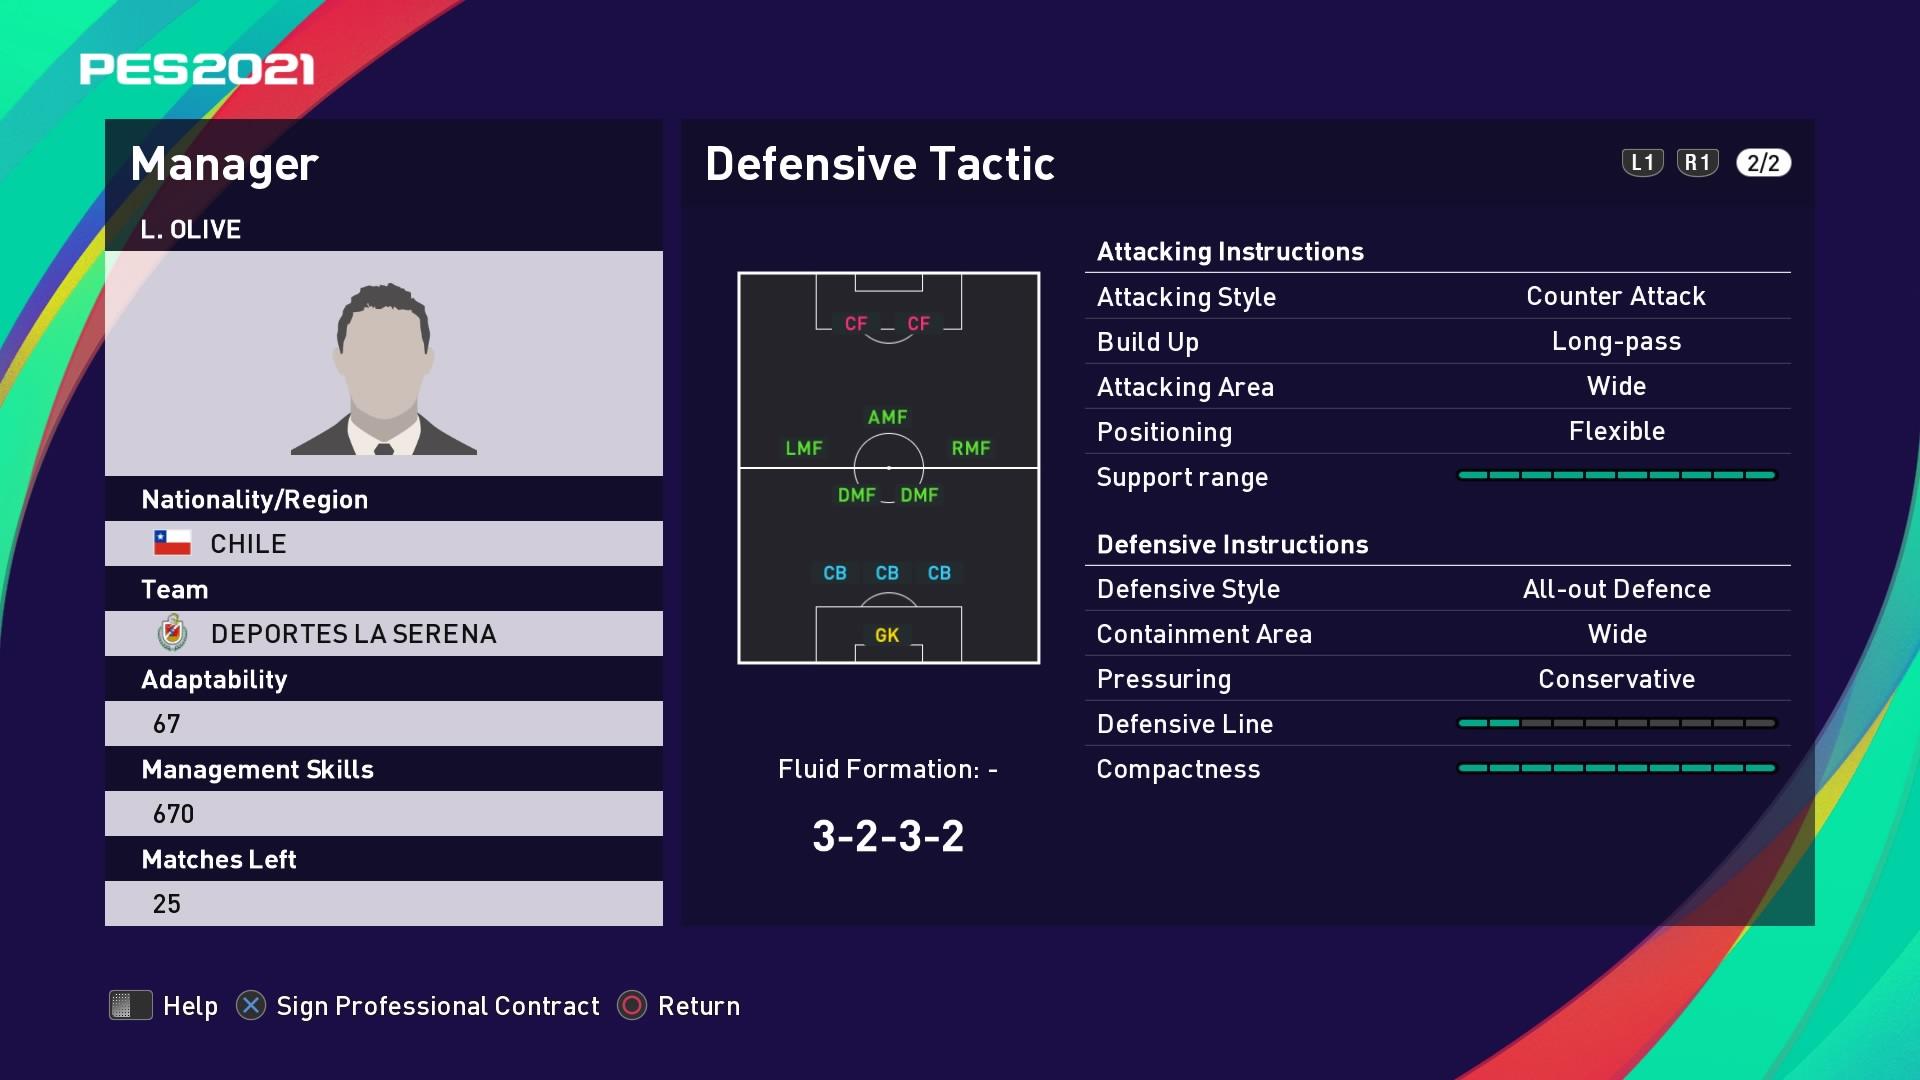 L. Olive (Francisco Bozán) Defensive Tactic in PES 2021 myClub